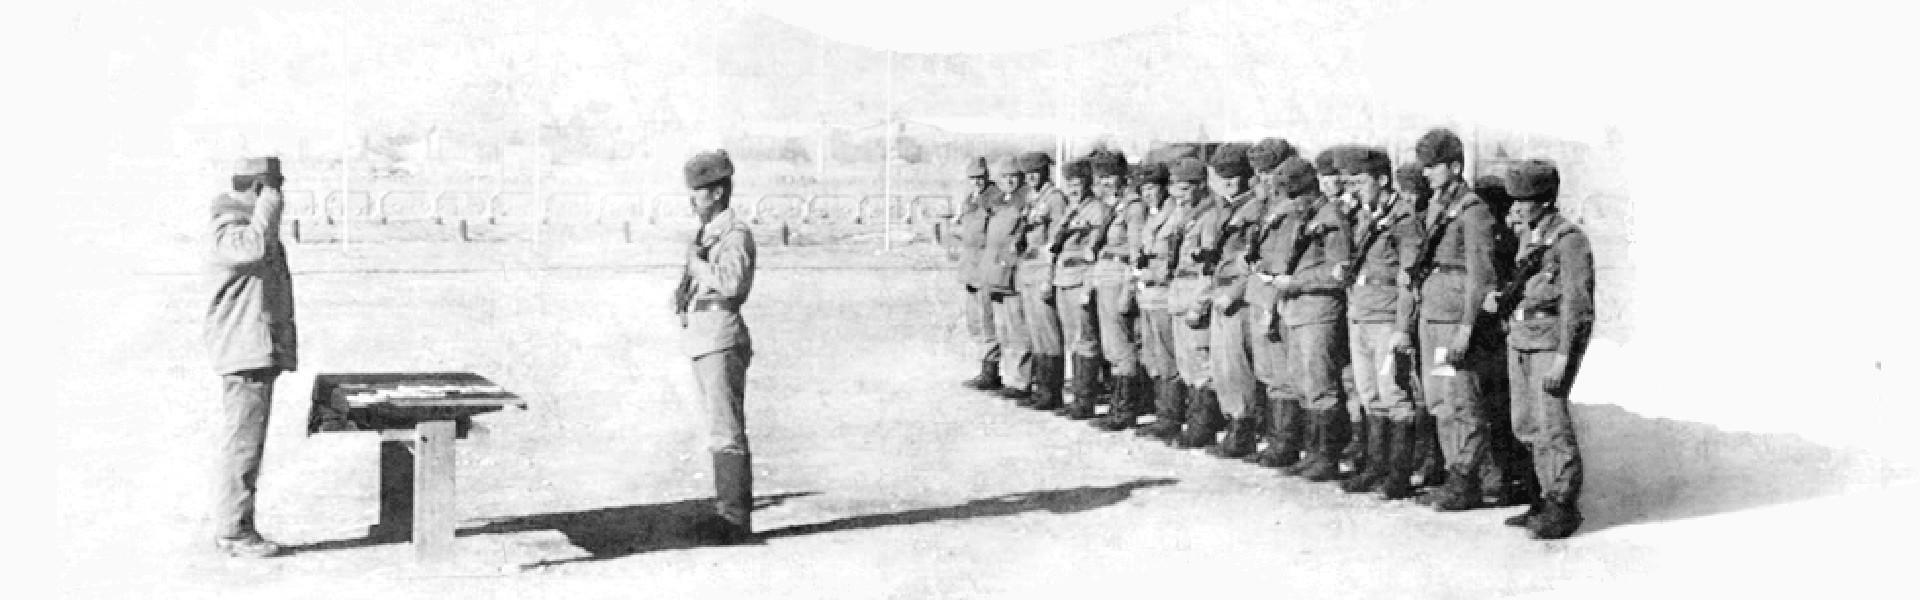 Seluruh tentara penerjun payung diberikan Ordo Spanduk Merah dan Ordo Bintang Merah. Dua secara anumerta diberikan bintang emas Pahlawan Uni Soviet.